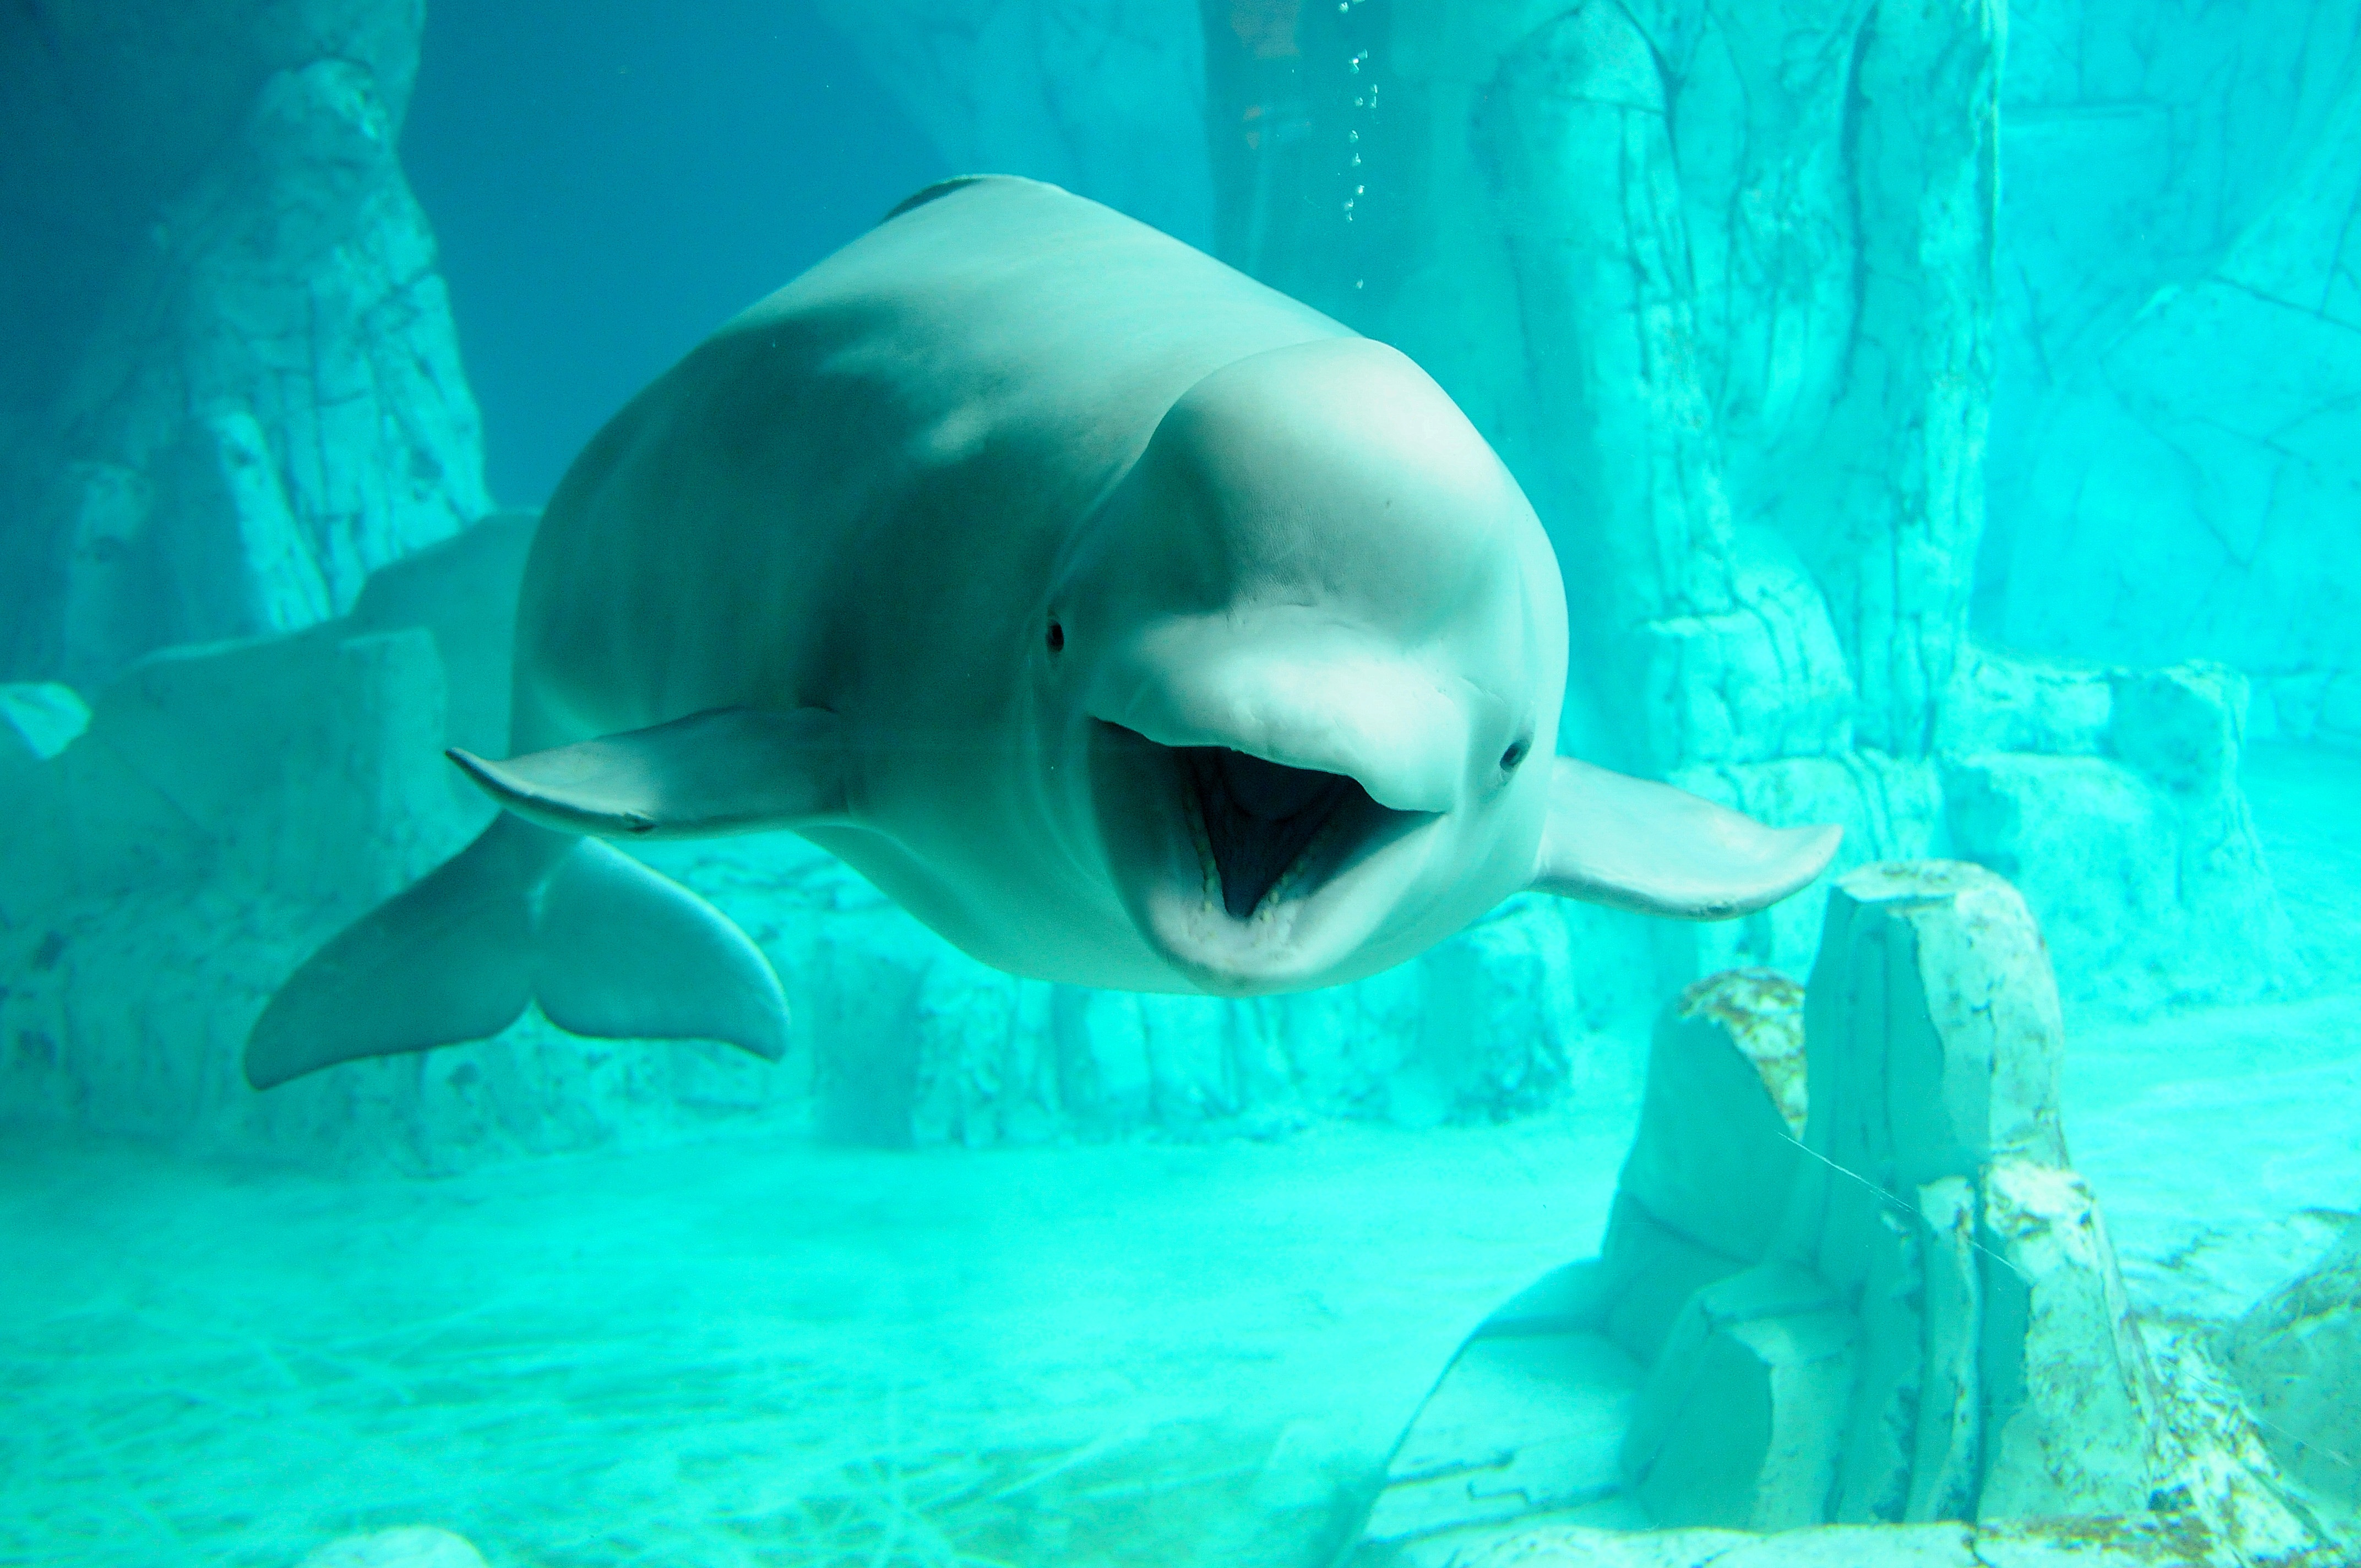 Beluga Whale Wallpaper Image Group 32 4288x2848